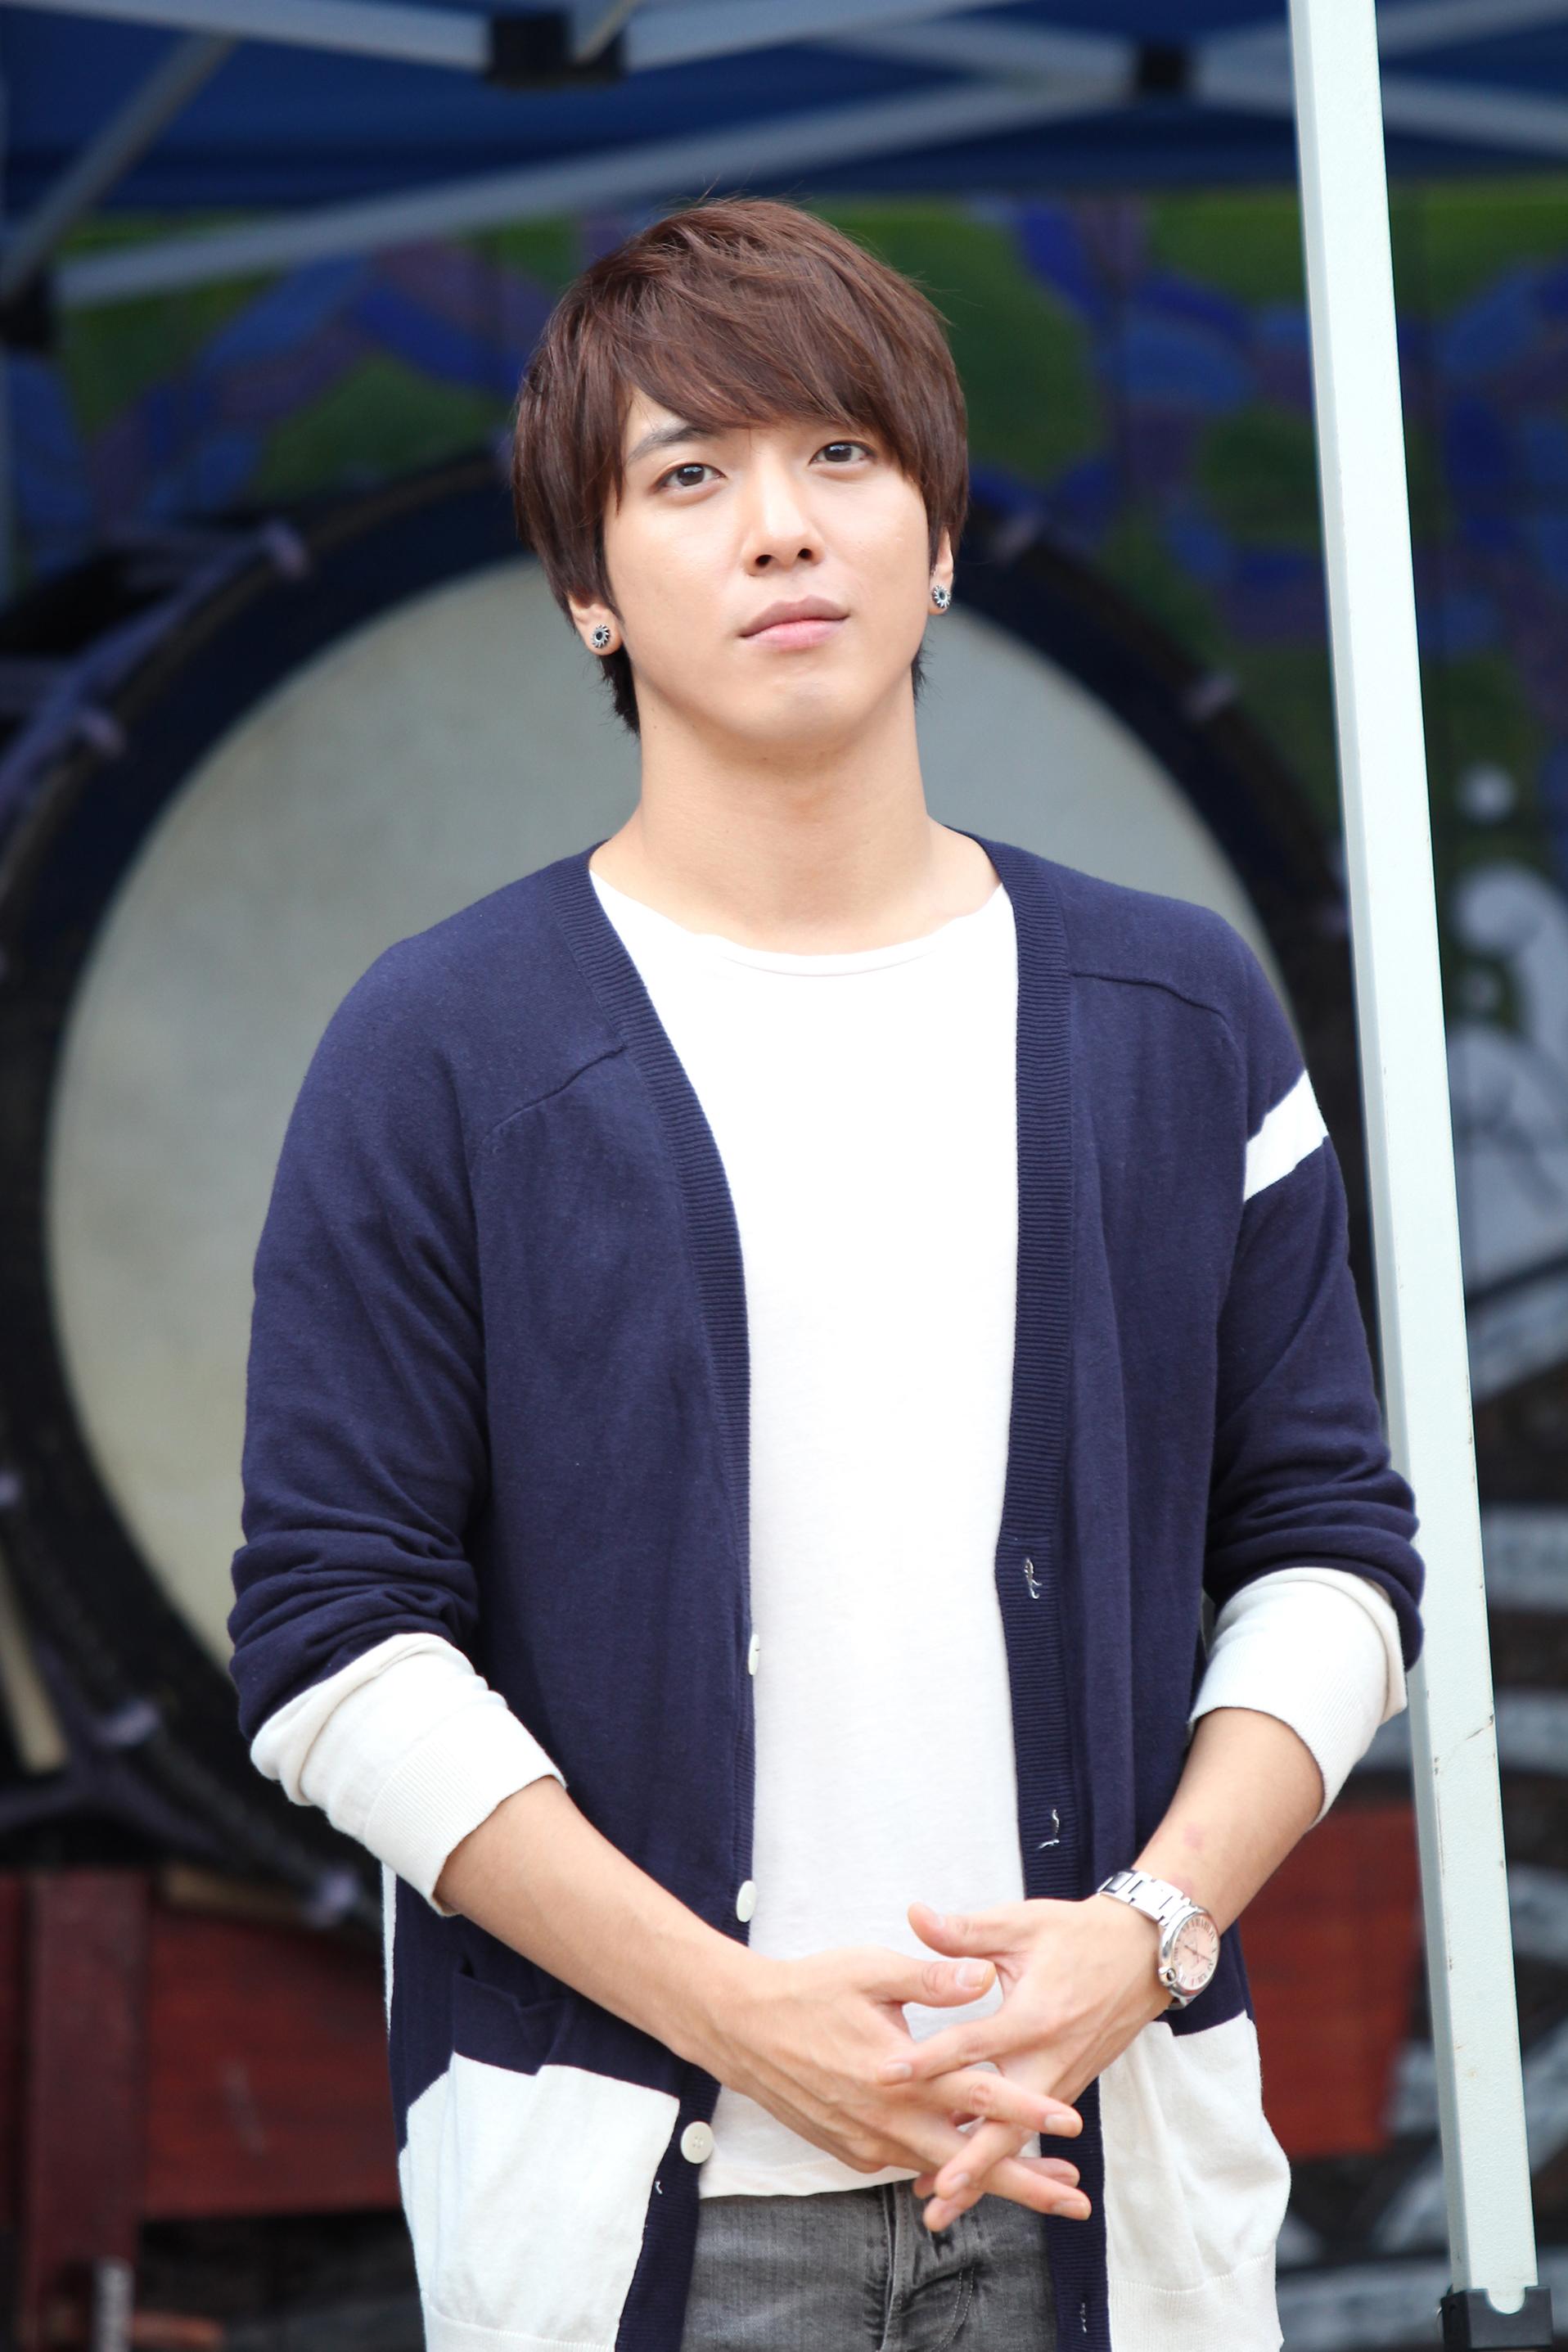 jung yong-hwa net worth